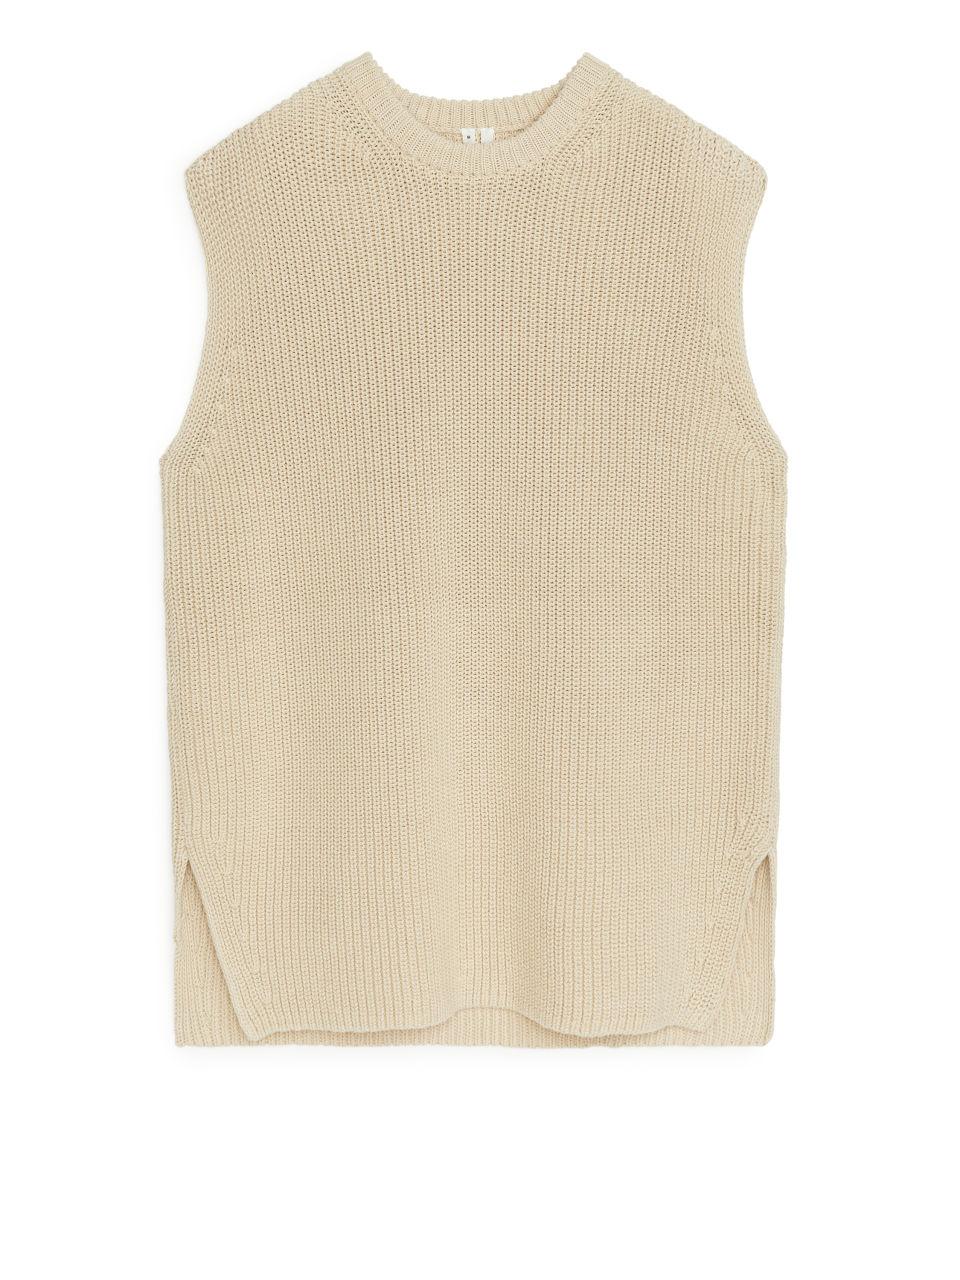 Knitted Vest - Beige